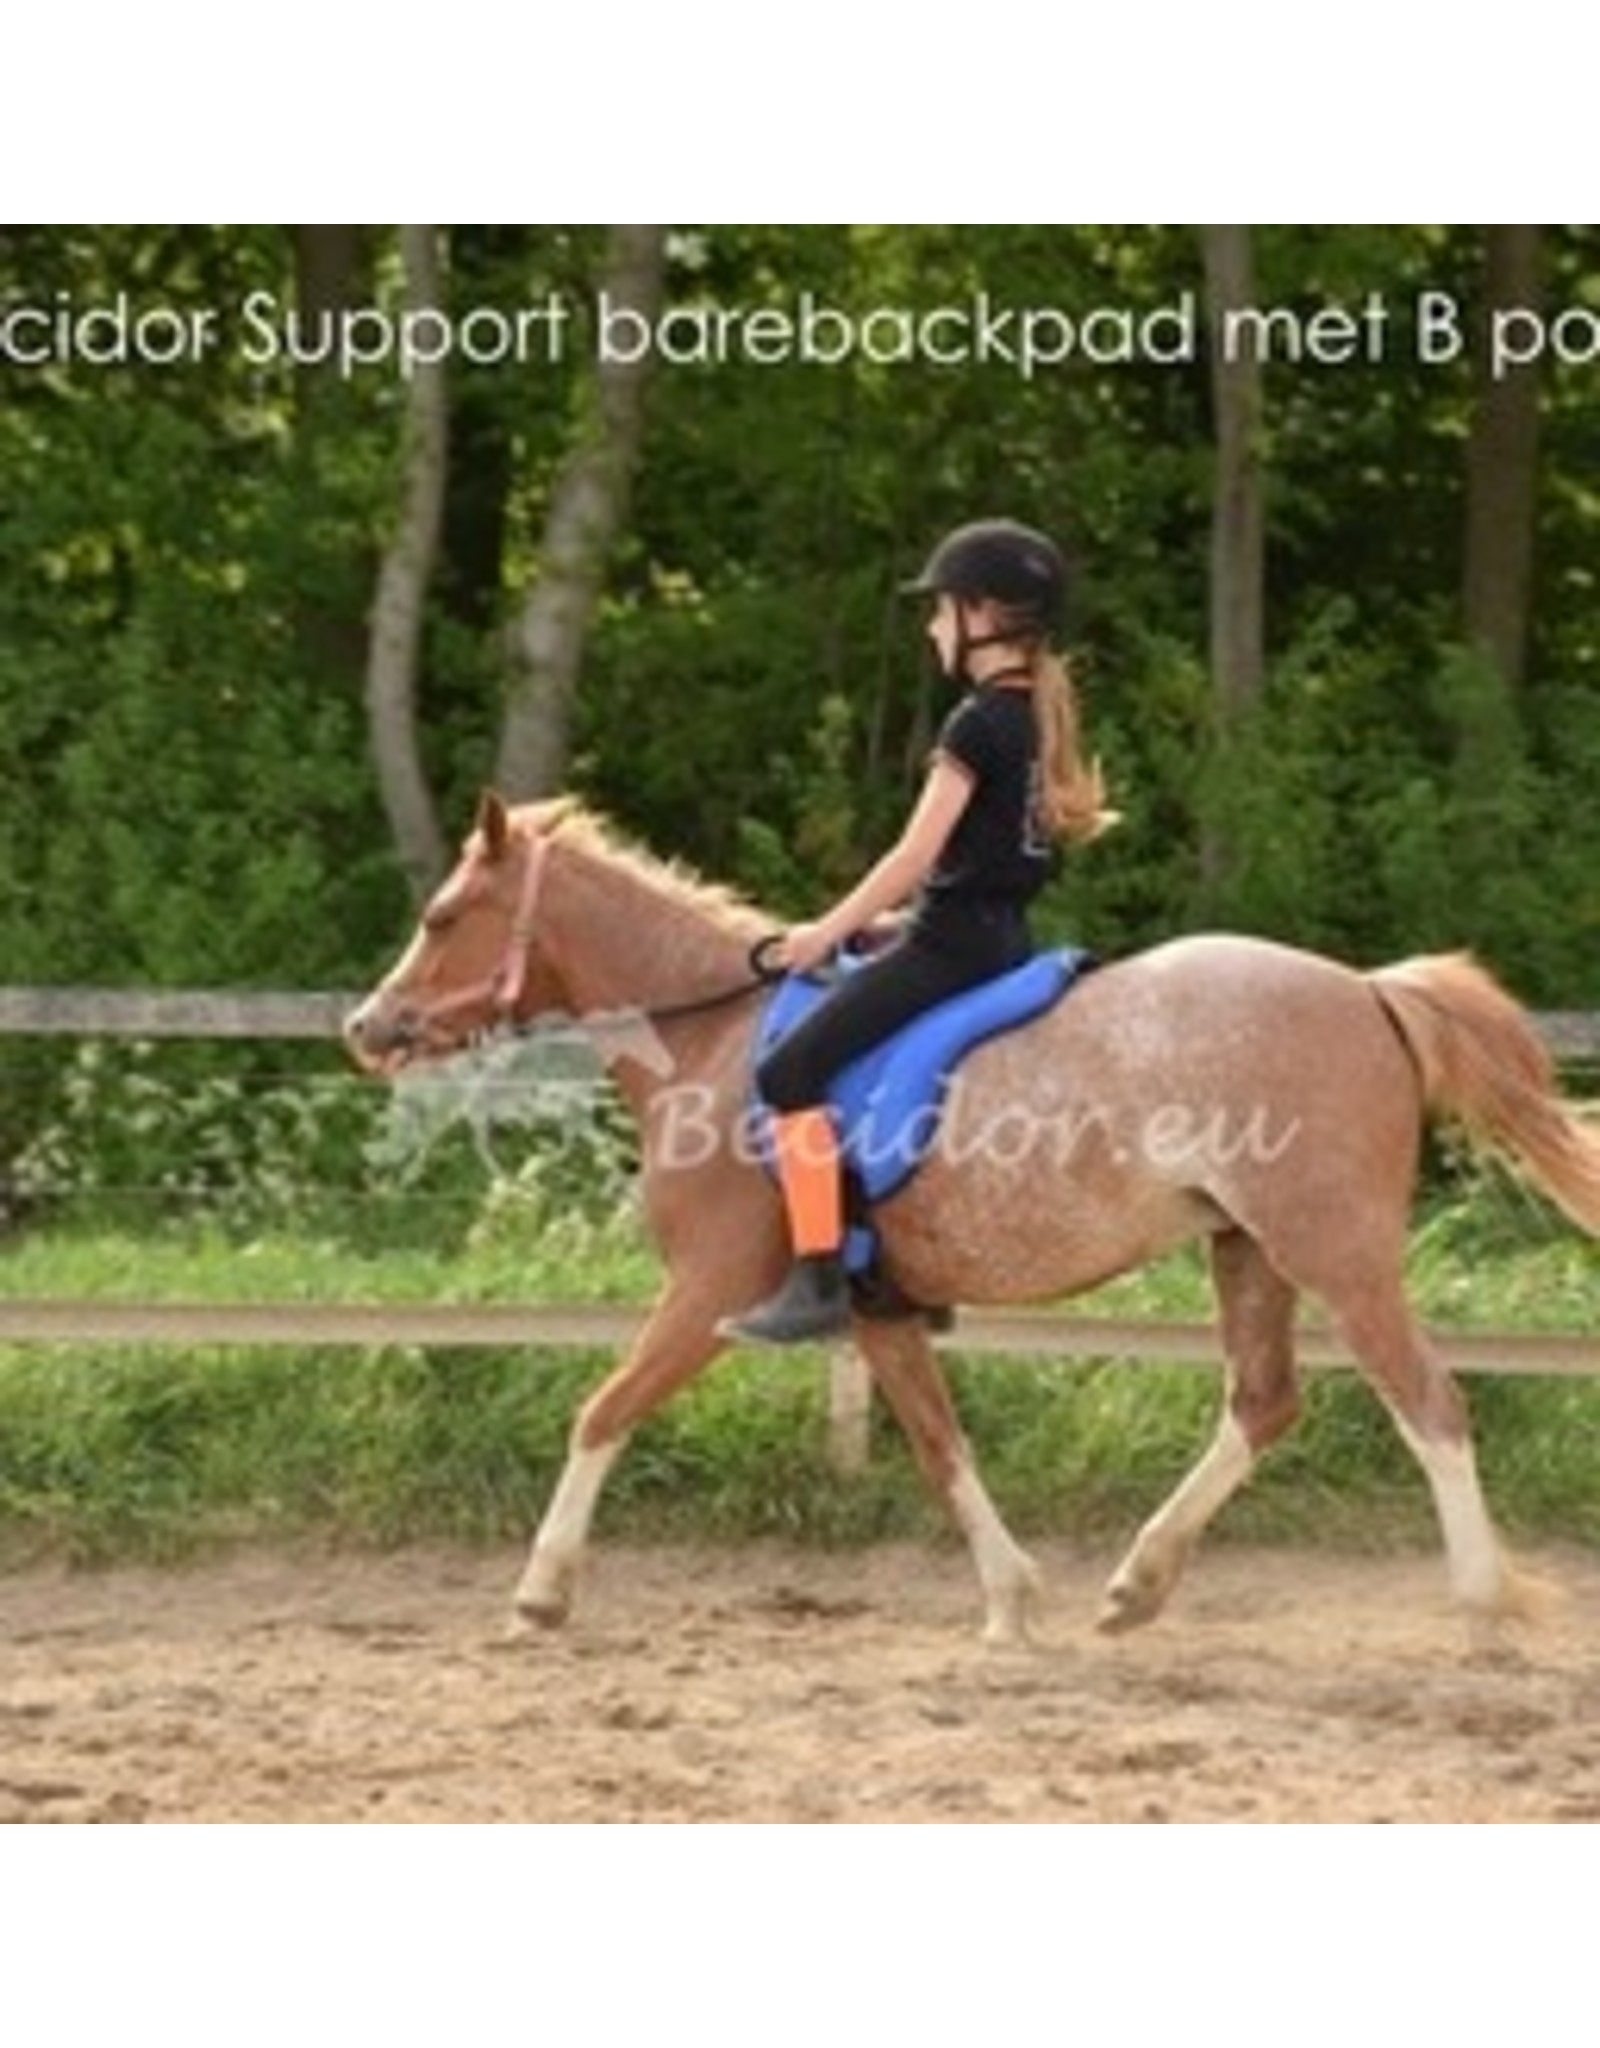 Becidor Barebackpad suède Support